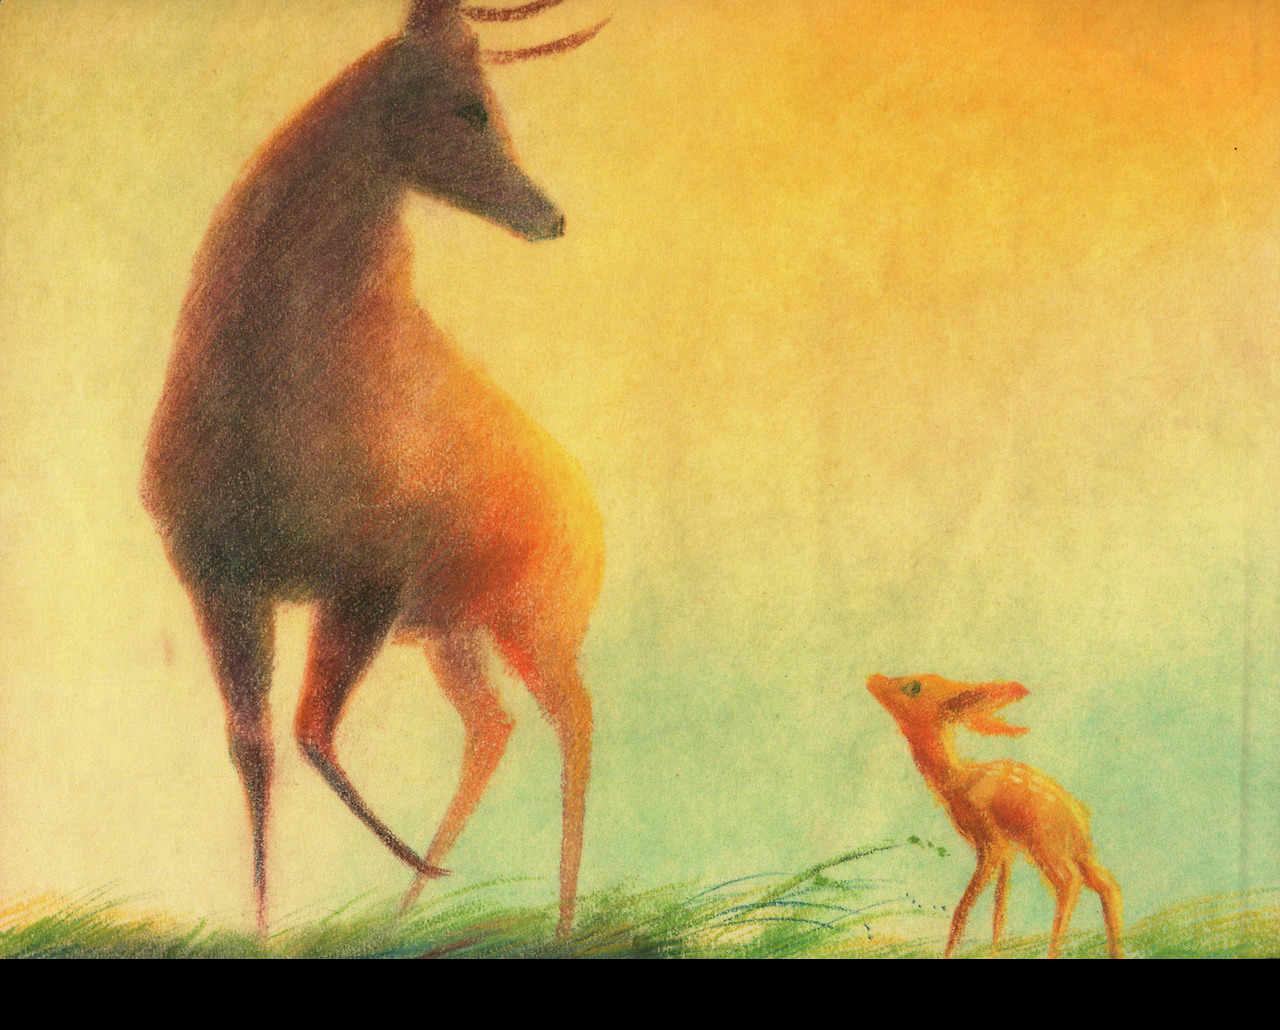 Tyrus Wong, 'Bambi' Production Designer, Dies at 106 – Steve